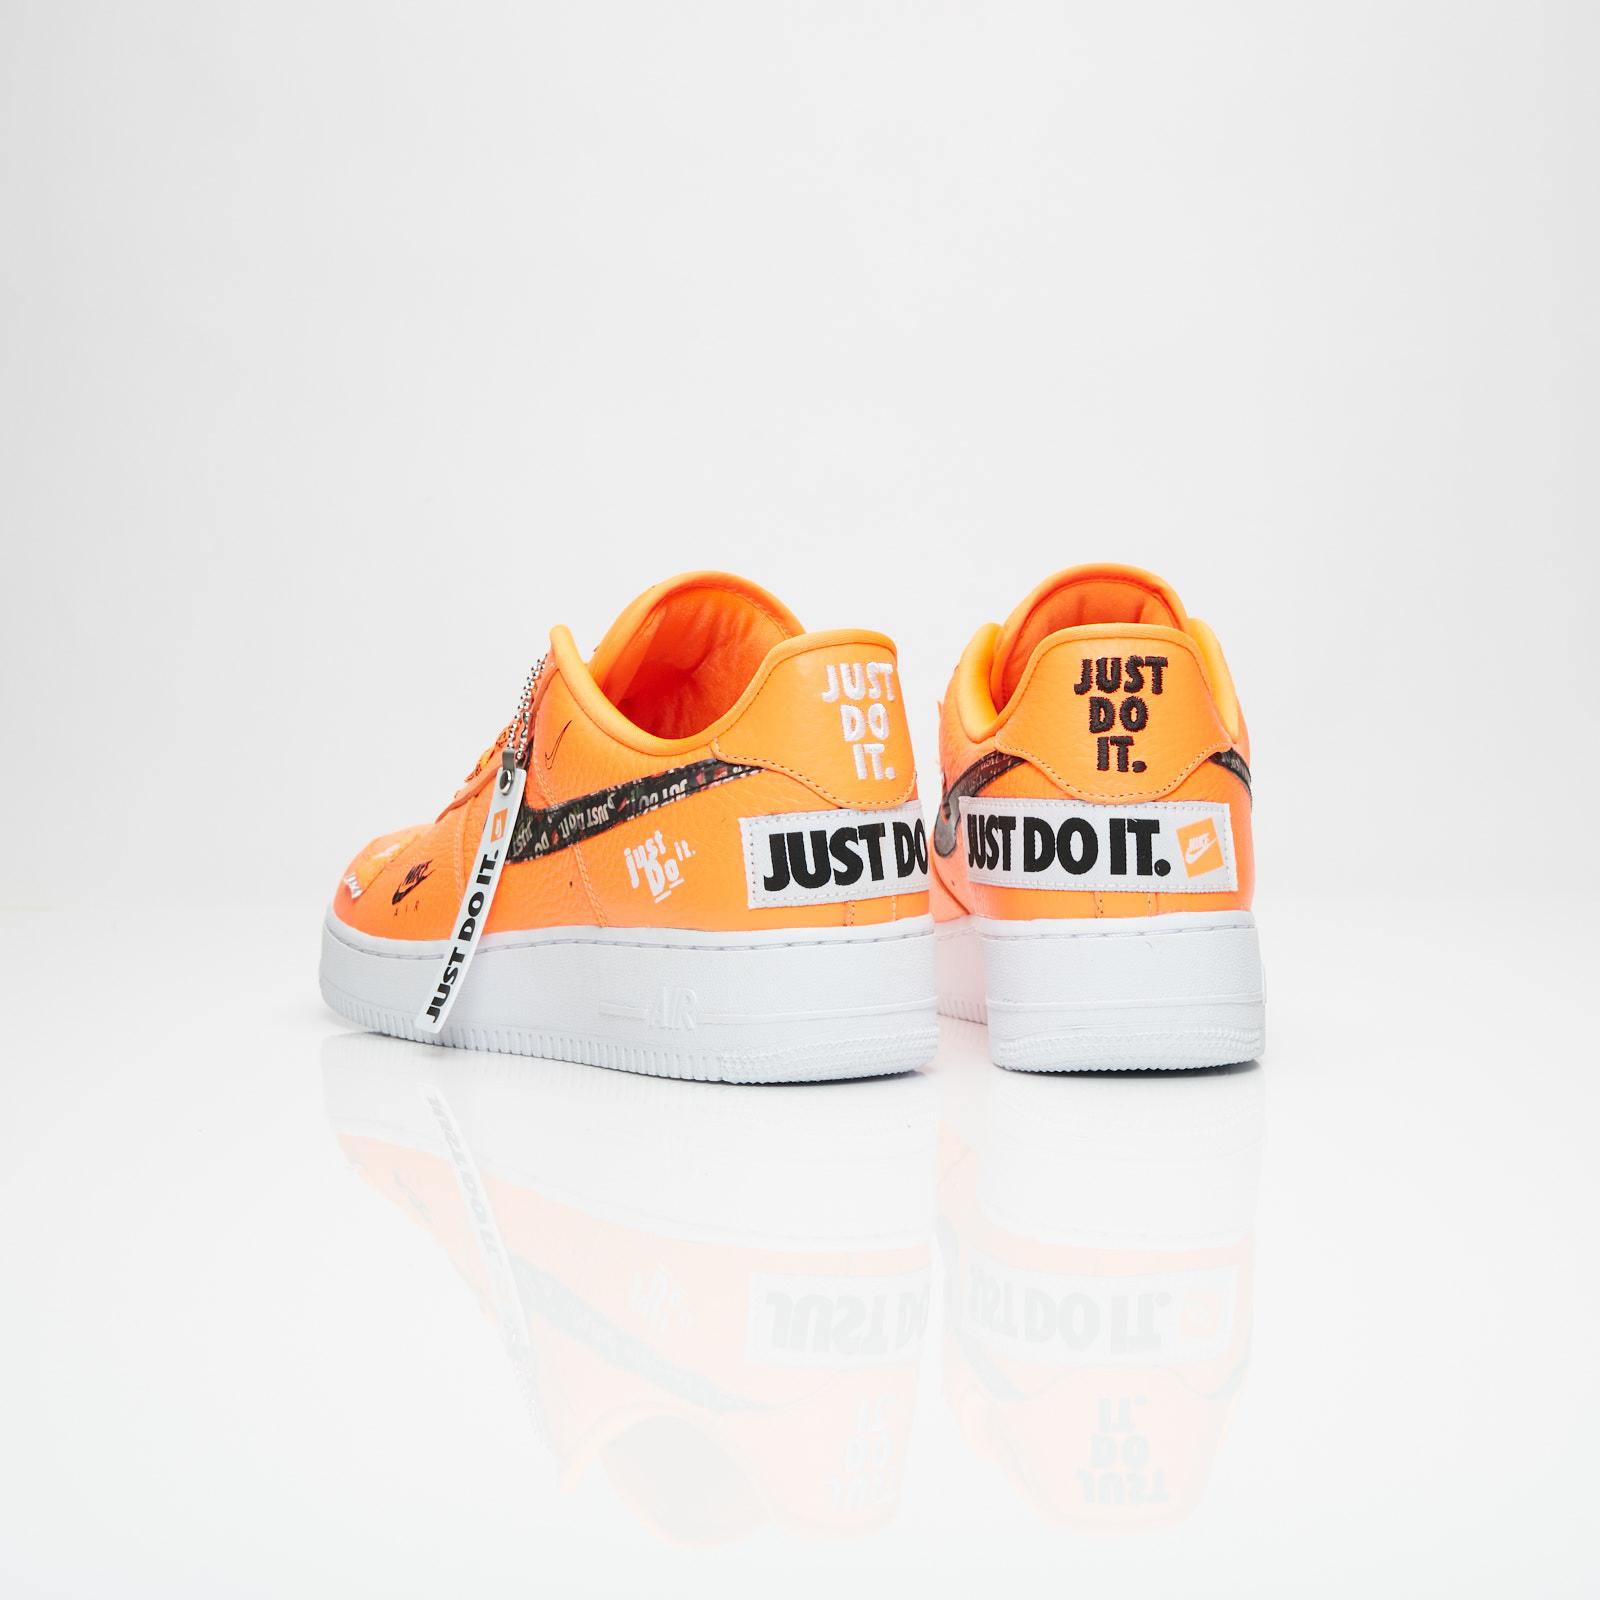 Nike Air Force 1 07 Premium Just Do It Ar7719 800